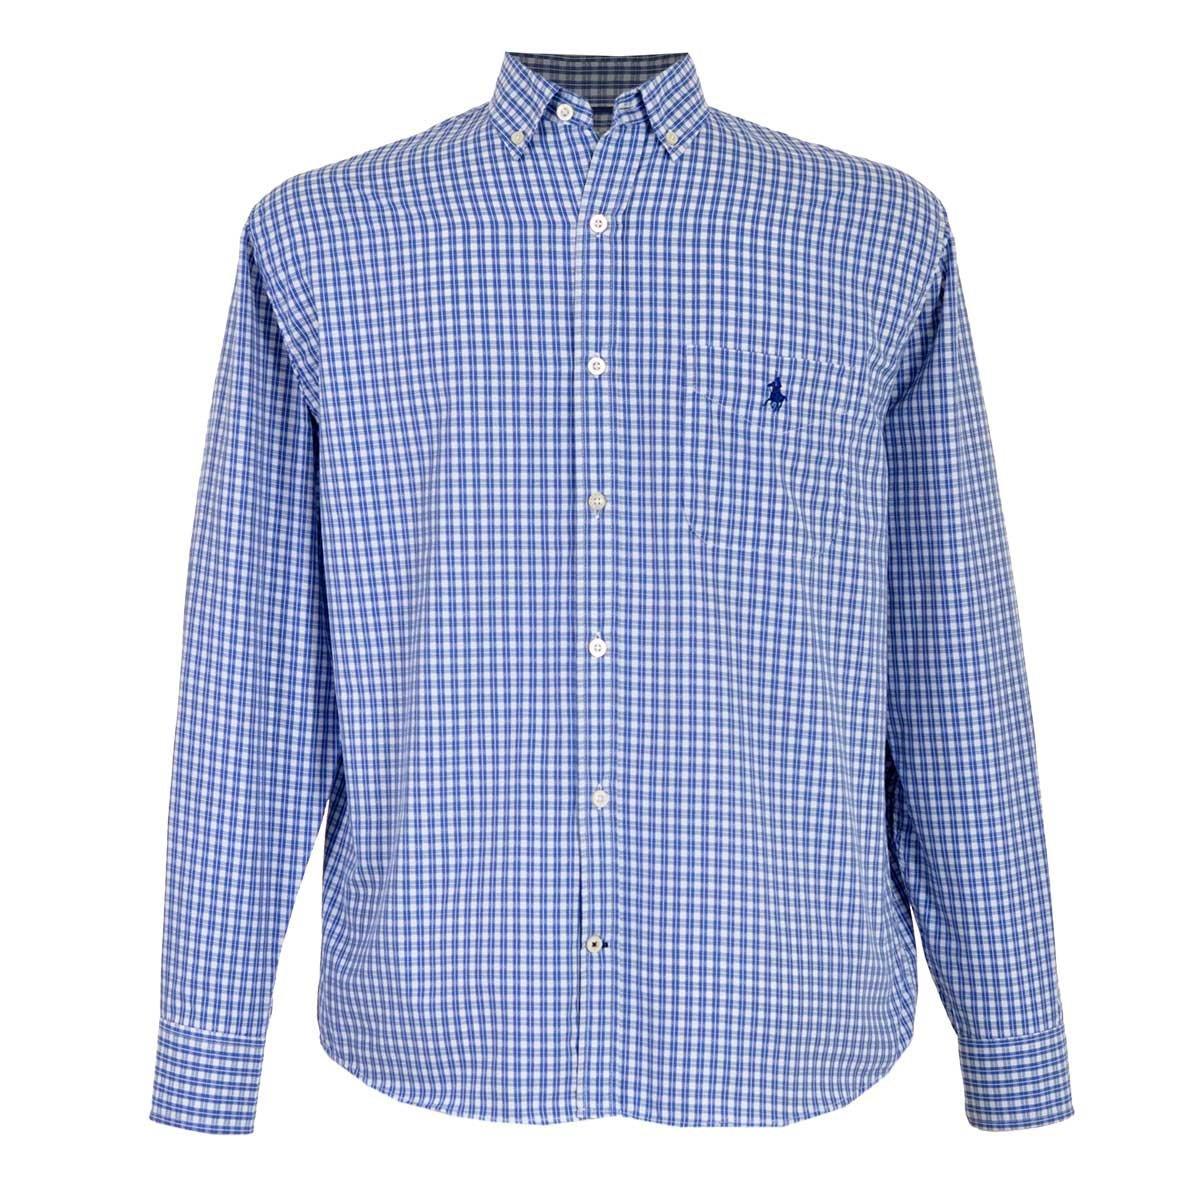 Camisa A Cuadros Polo Club Sears Com Mx Me Entiende 1d2eaed475371